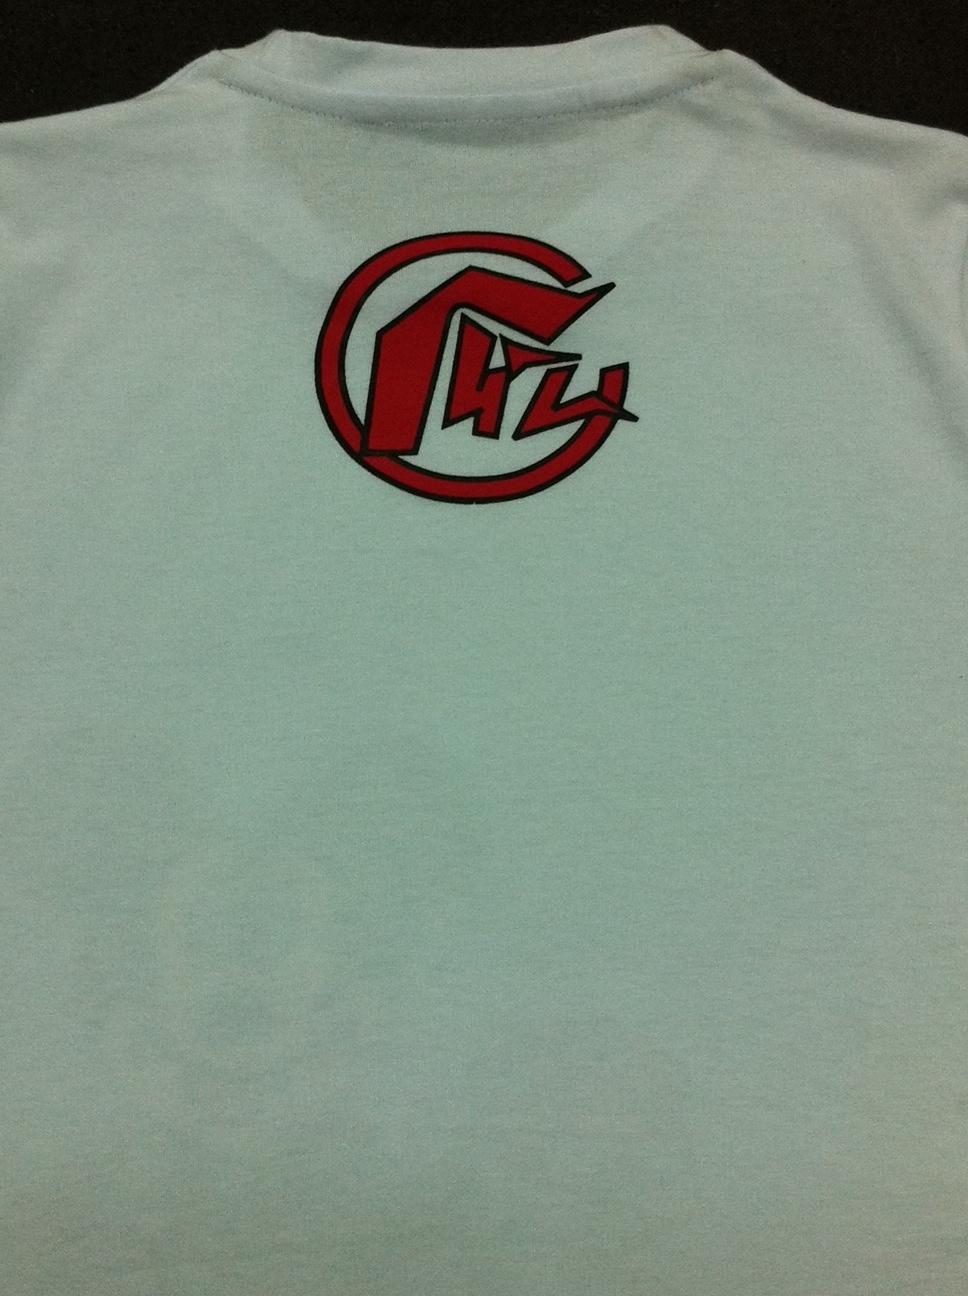 T shirt design job - Job Delivered 235